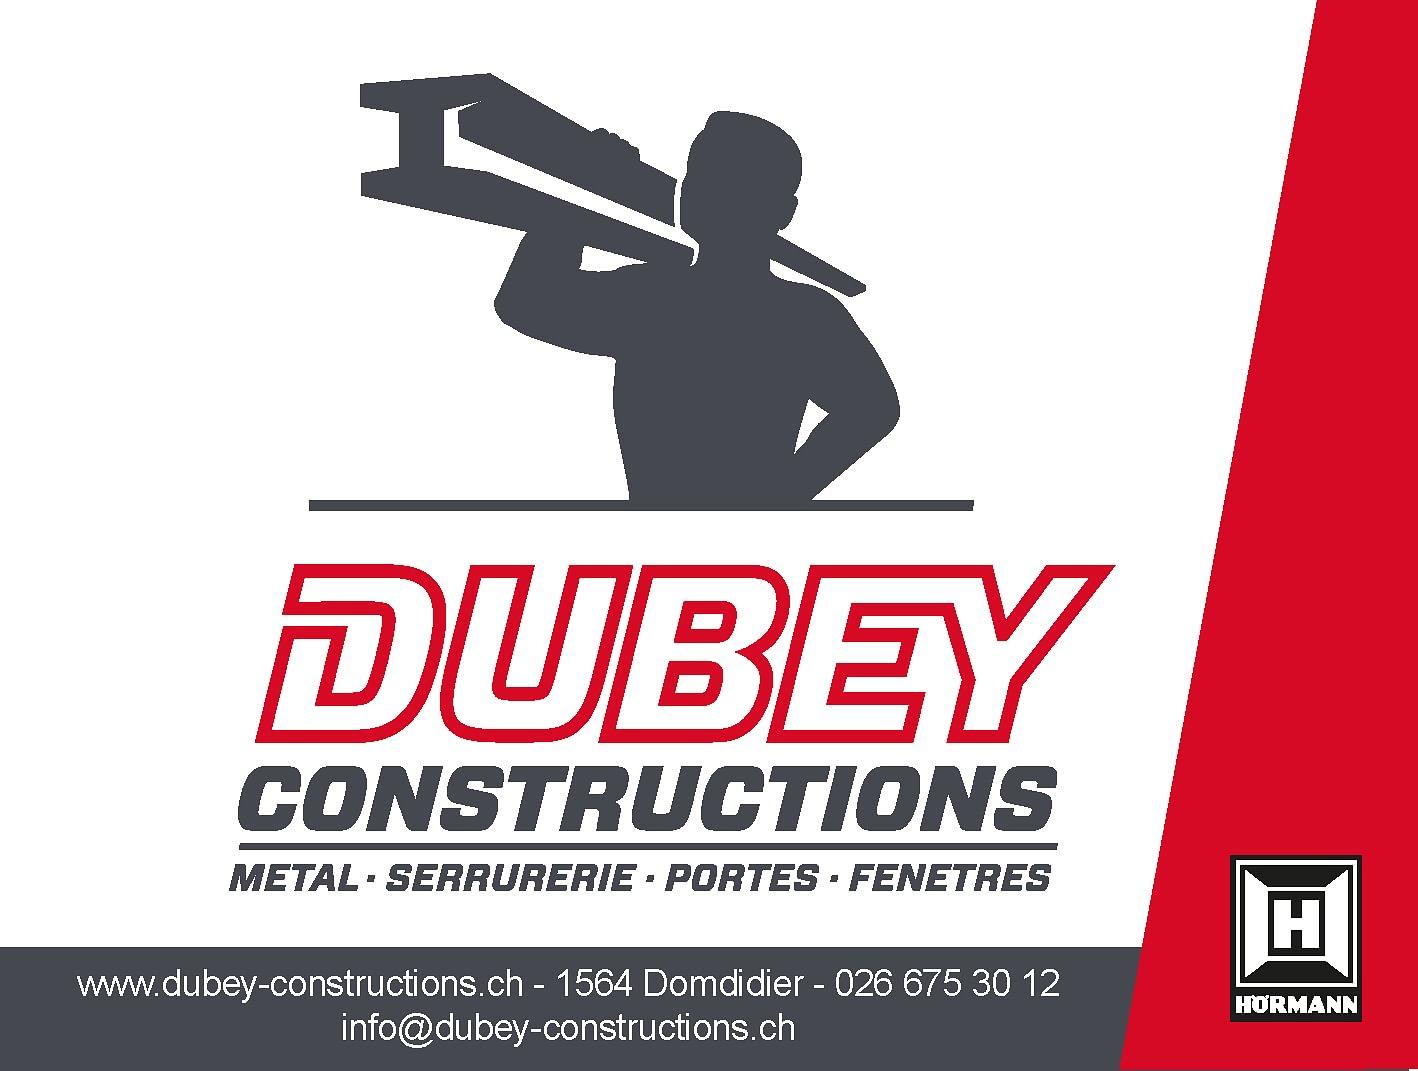 Dubey Constructions Sàrl